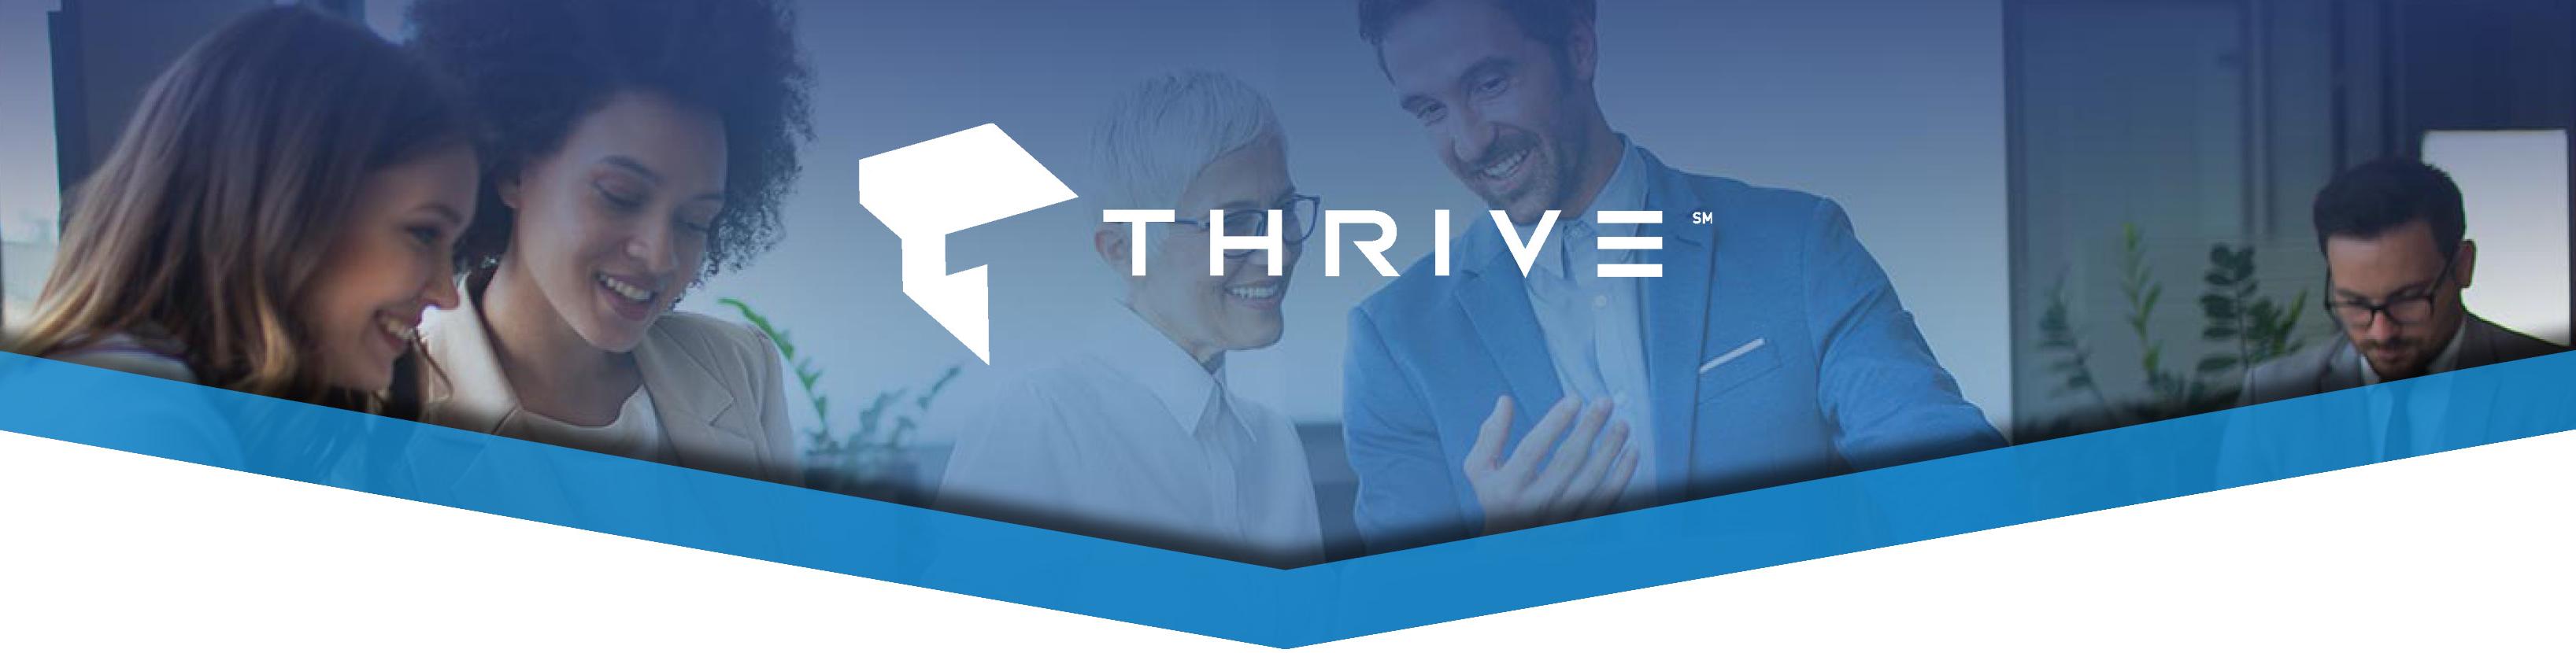 Thrive Channel Program